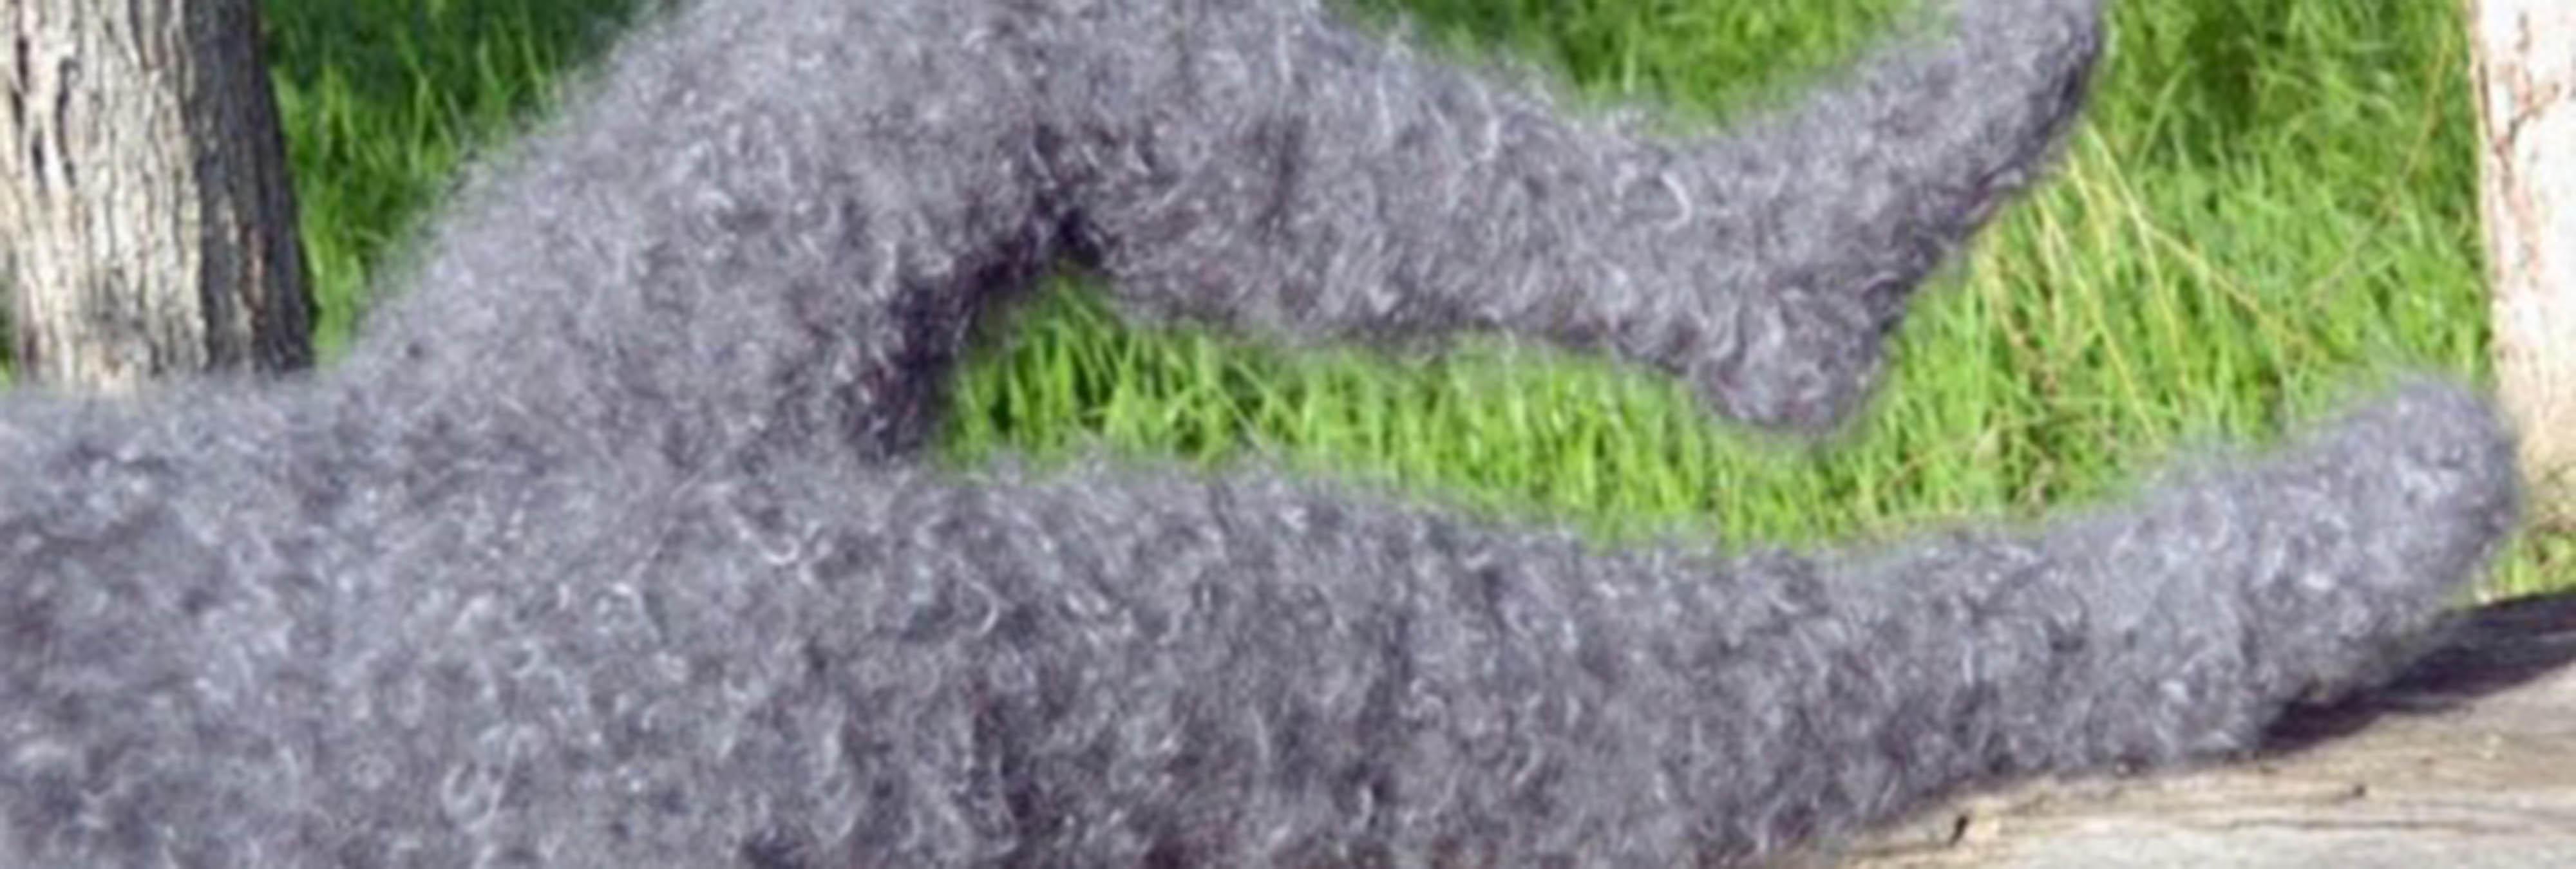 Rusia planta cara al frío con leggins de pelo, literalmente